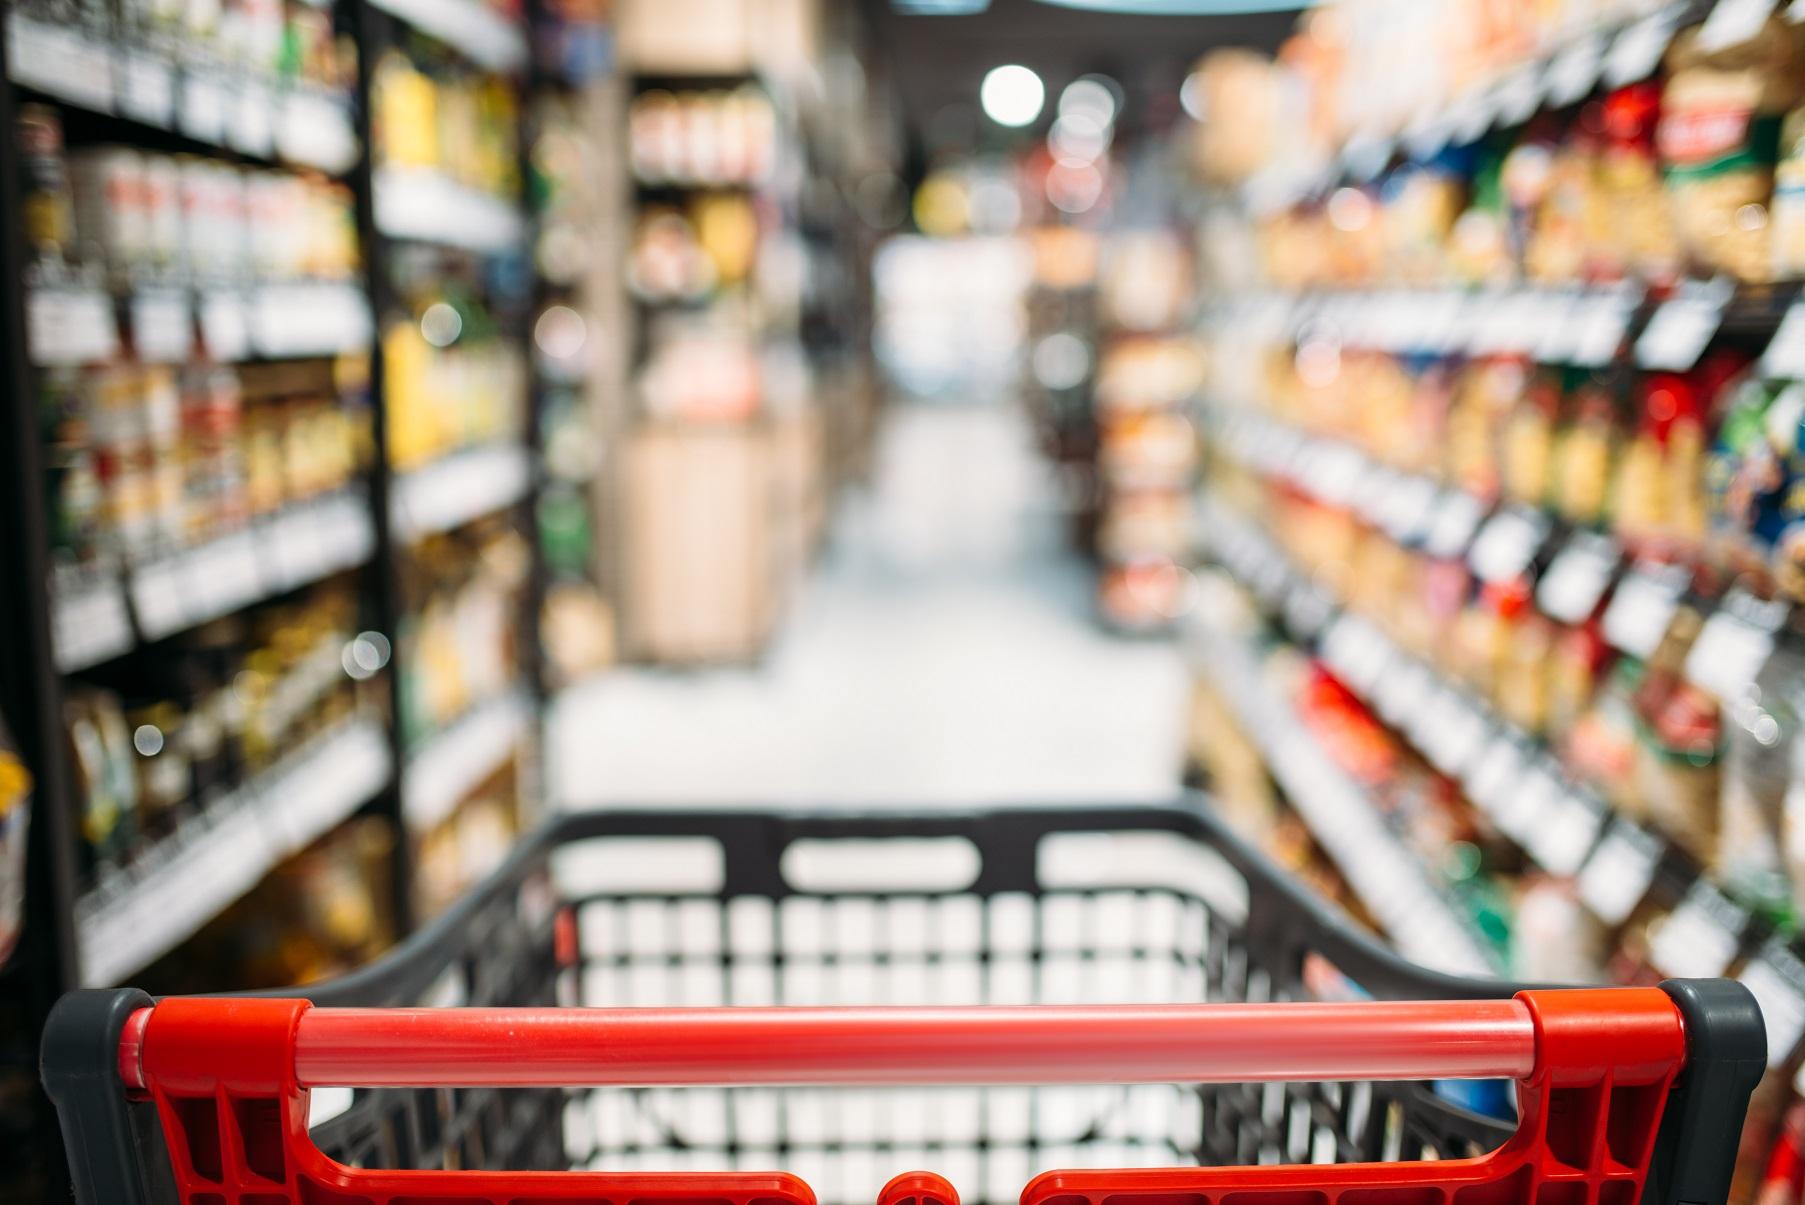 shopping cart between shelves in food store F6AM7GN #новости инфляция, статистика, экономика